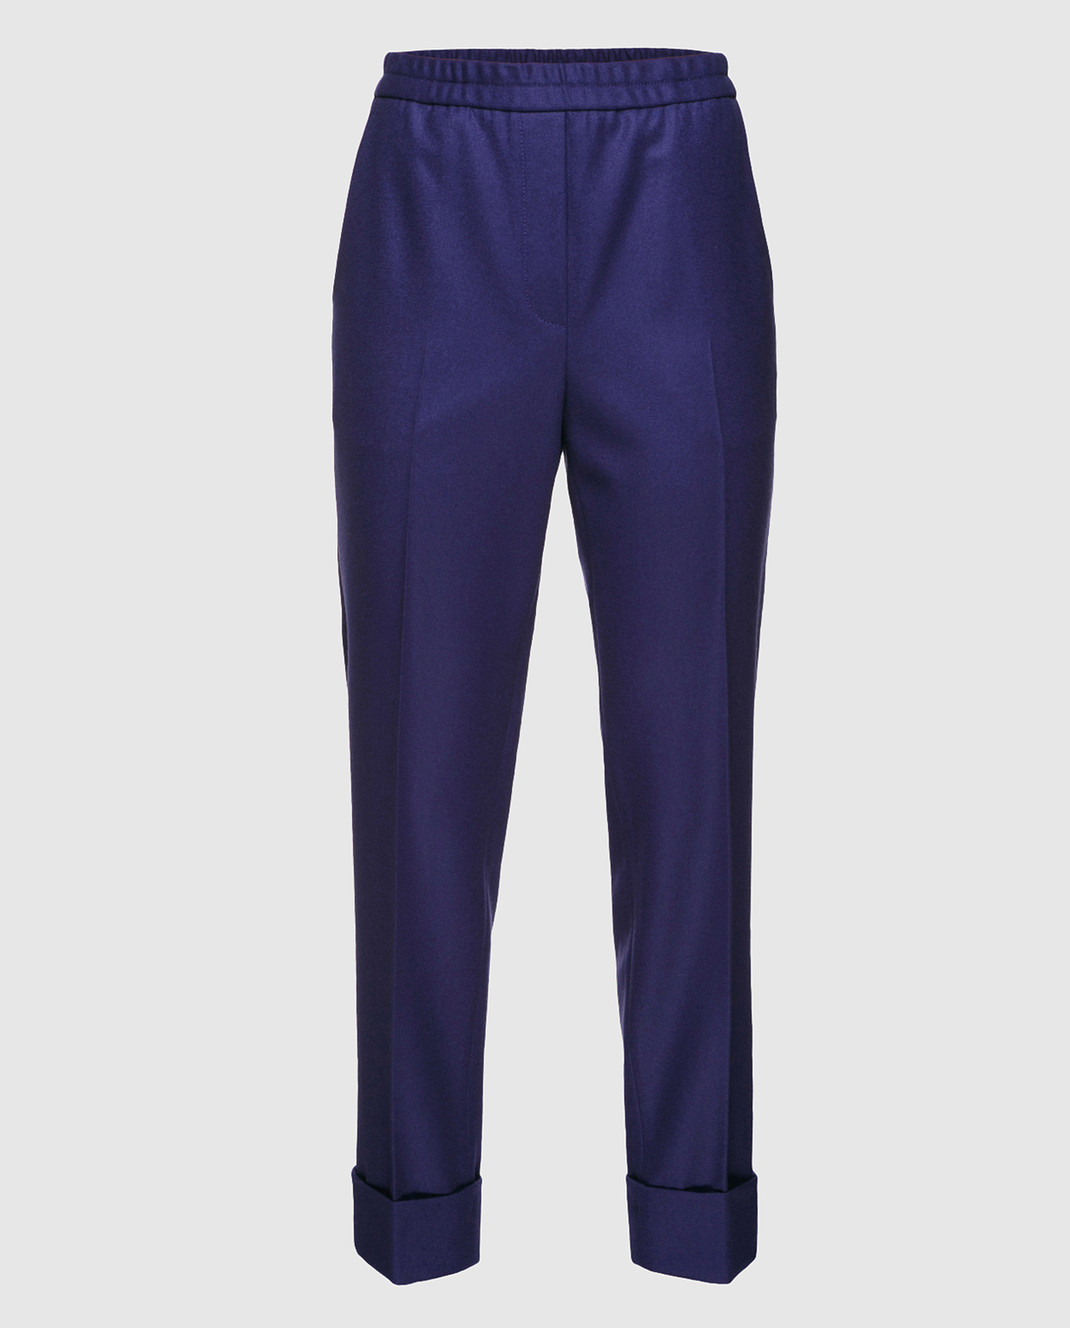 Bottega Veneta Синие брюки 513214